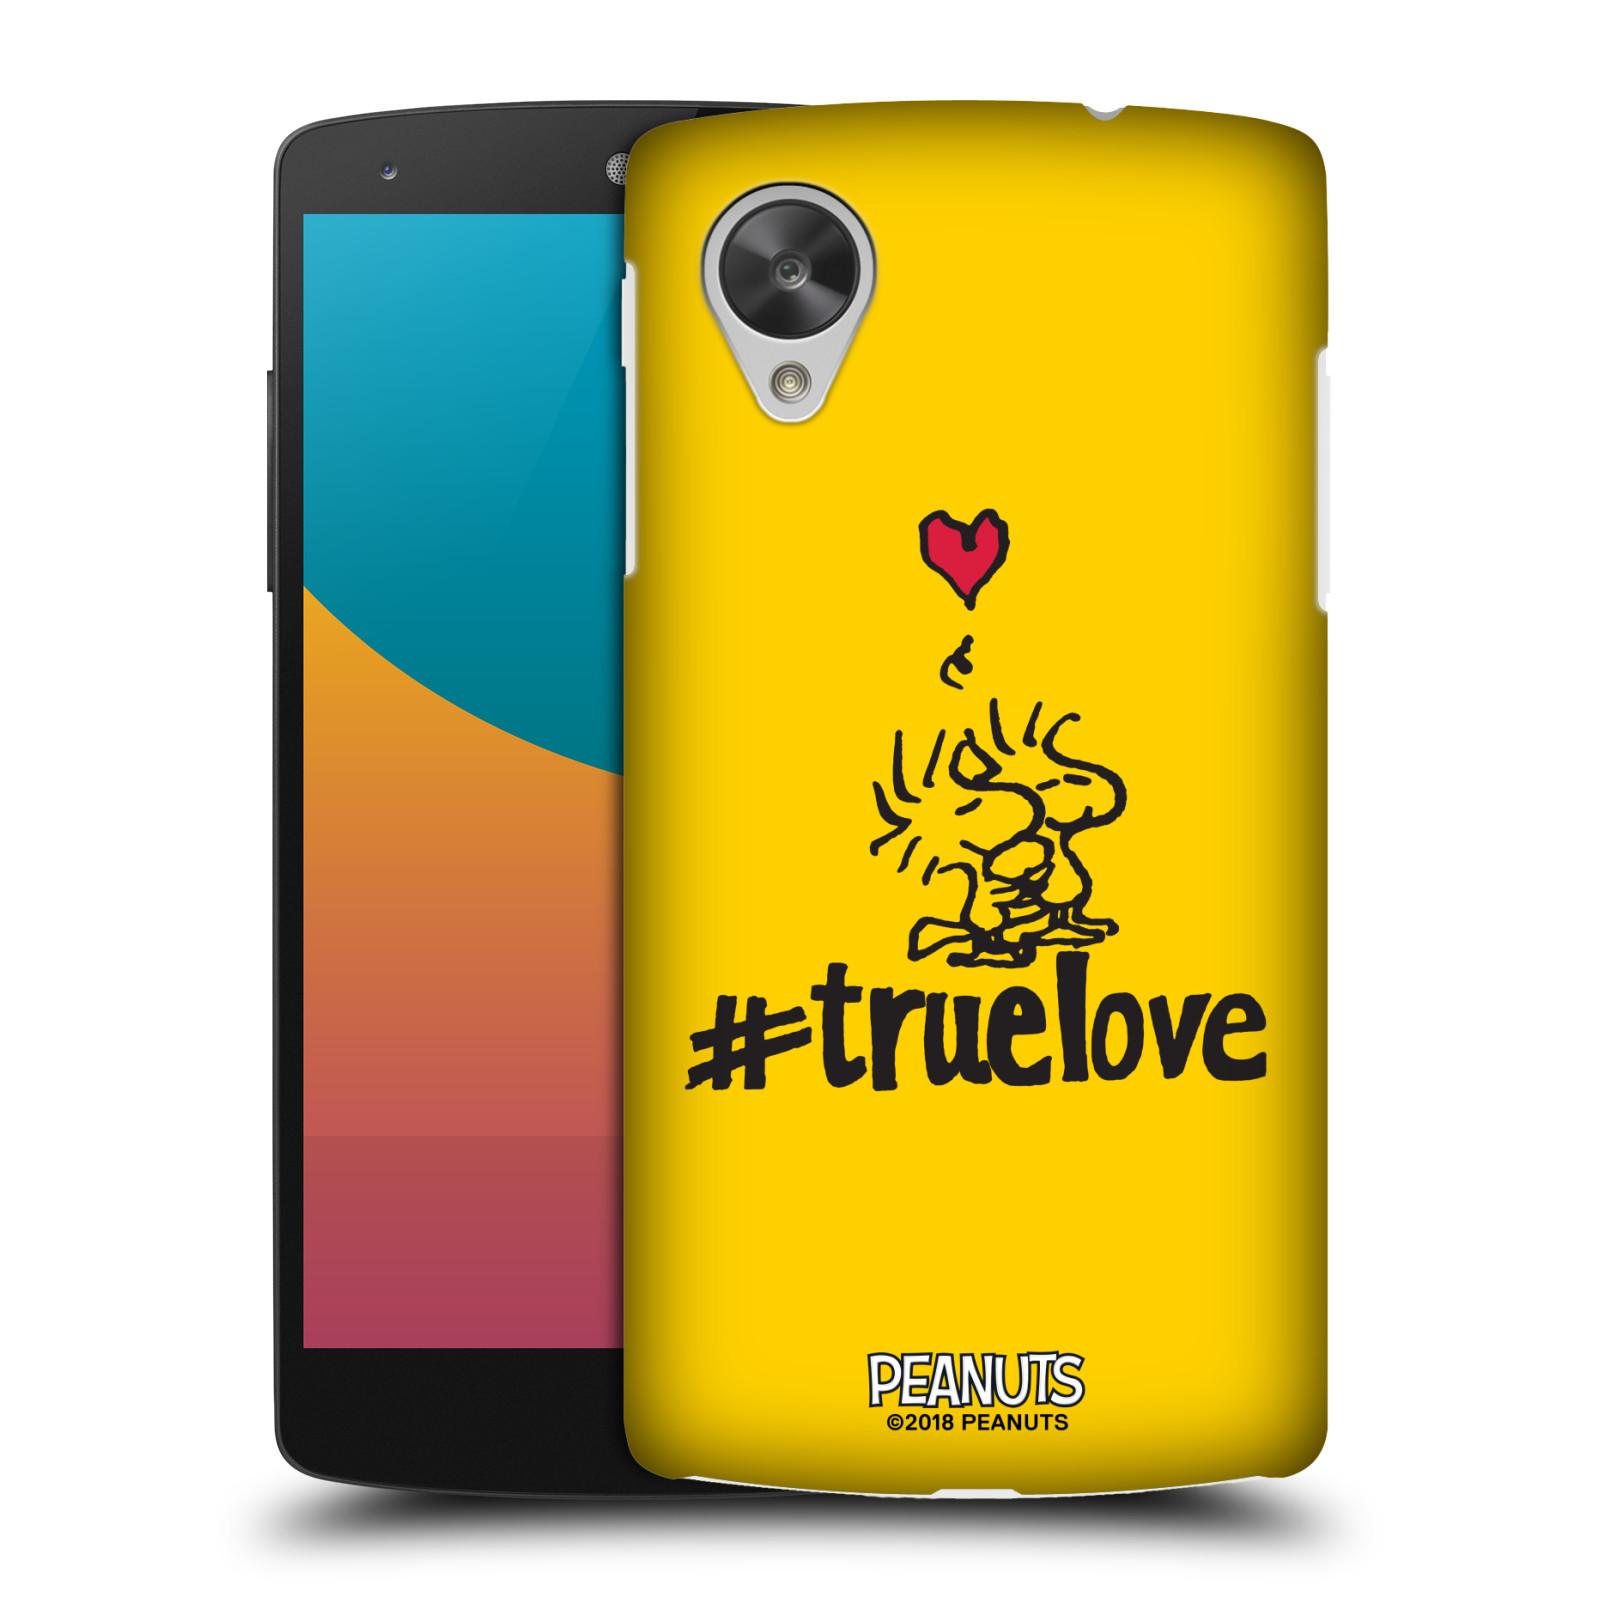 Pouzdro na mobil LG Nexus 5 Oficiální motiv Peanuts ptáčci žlutá barva srdíčko